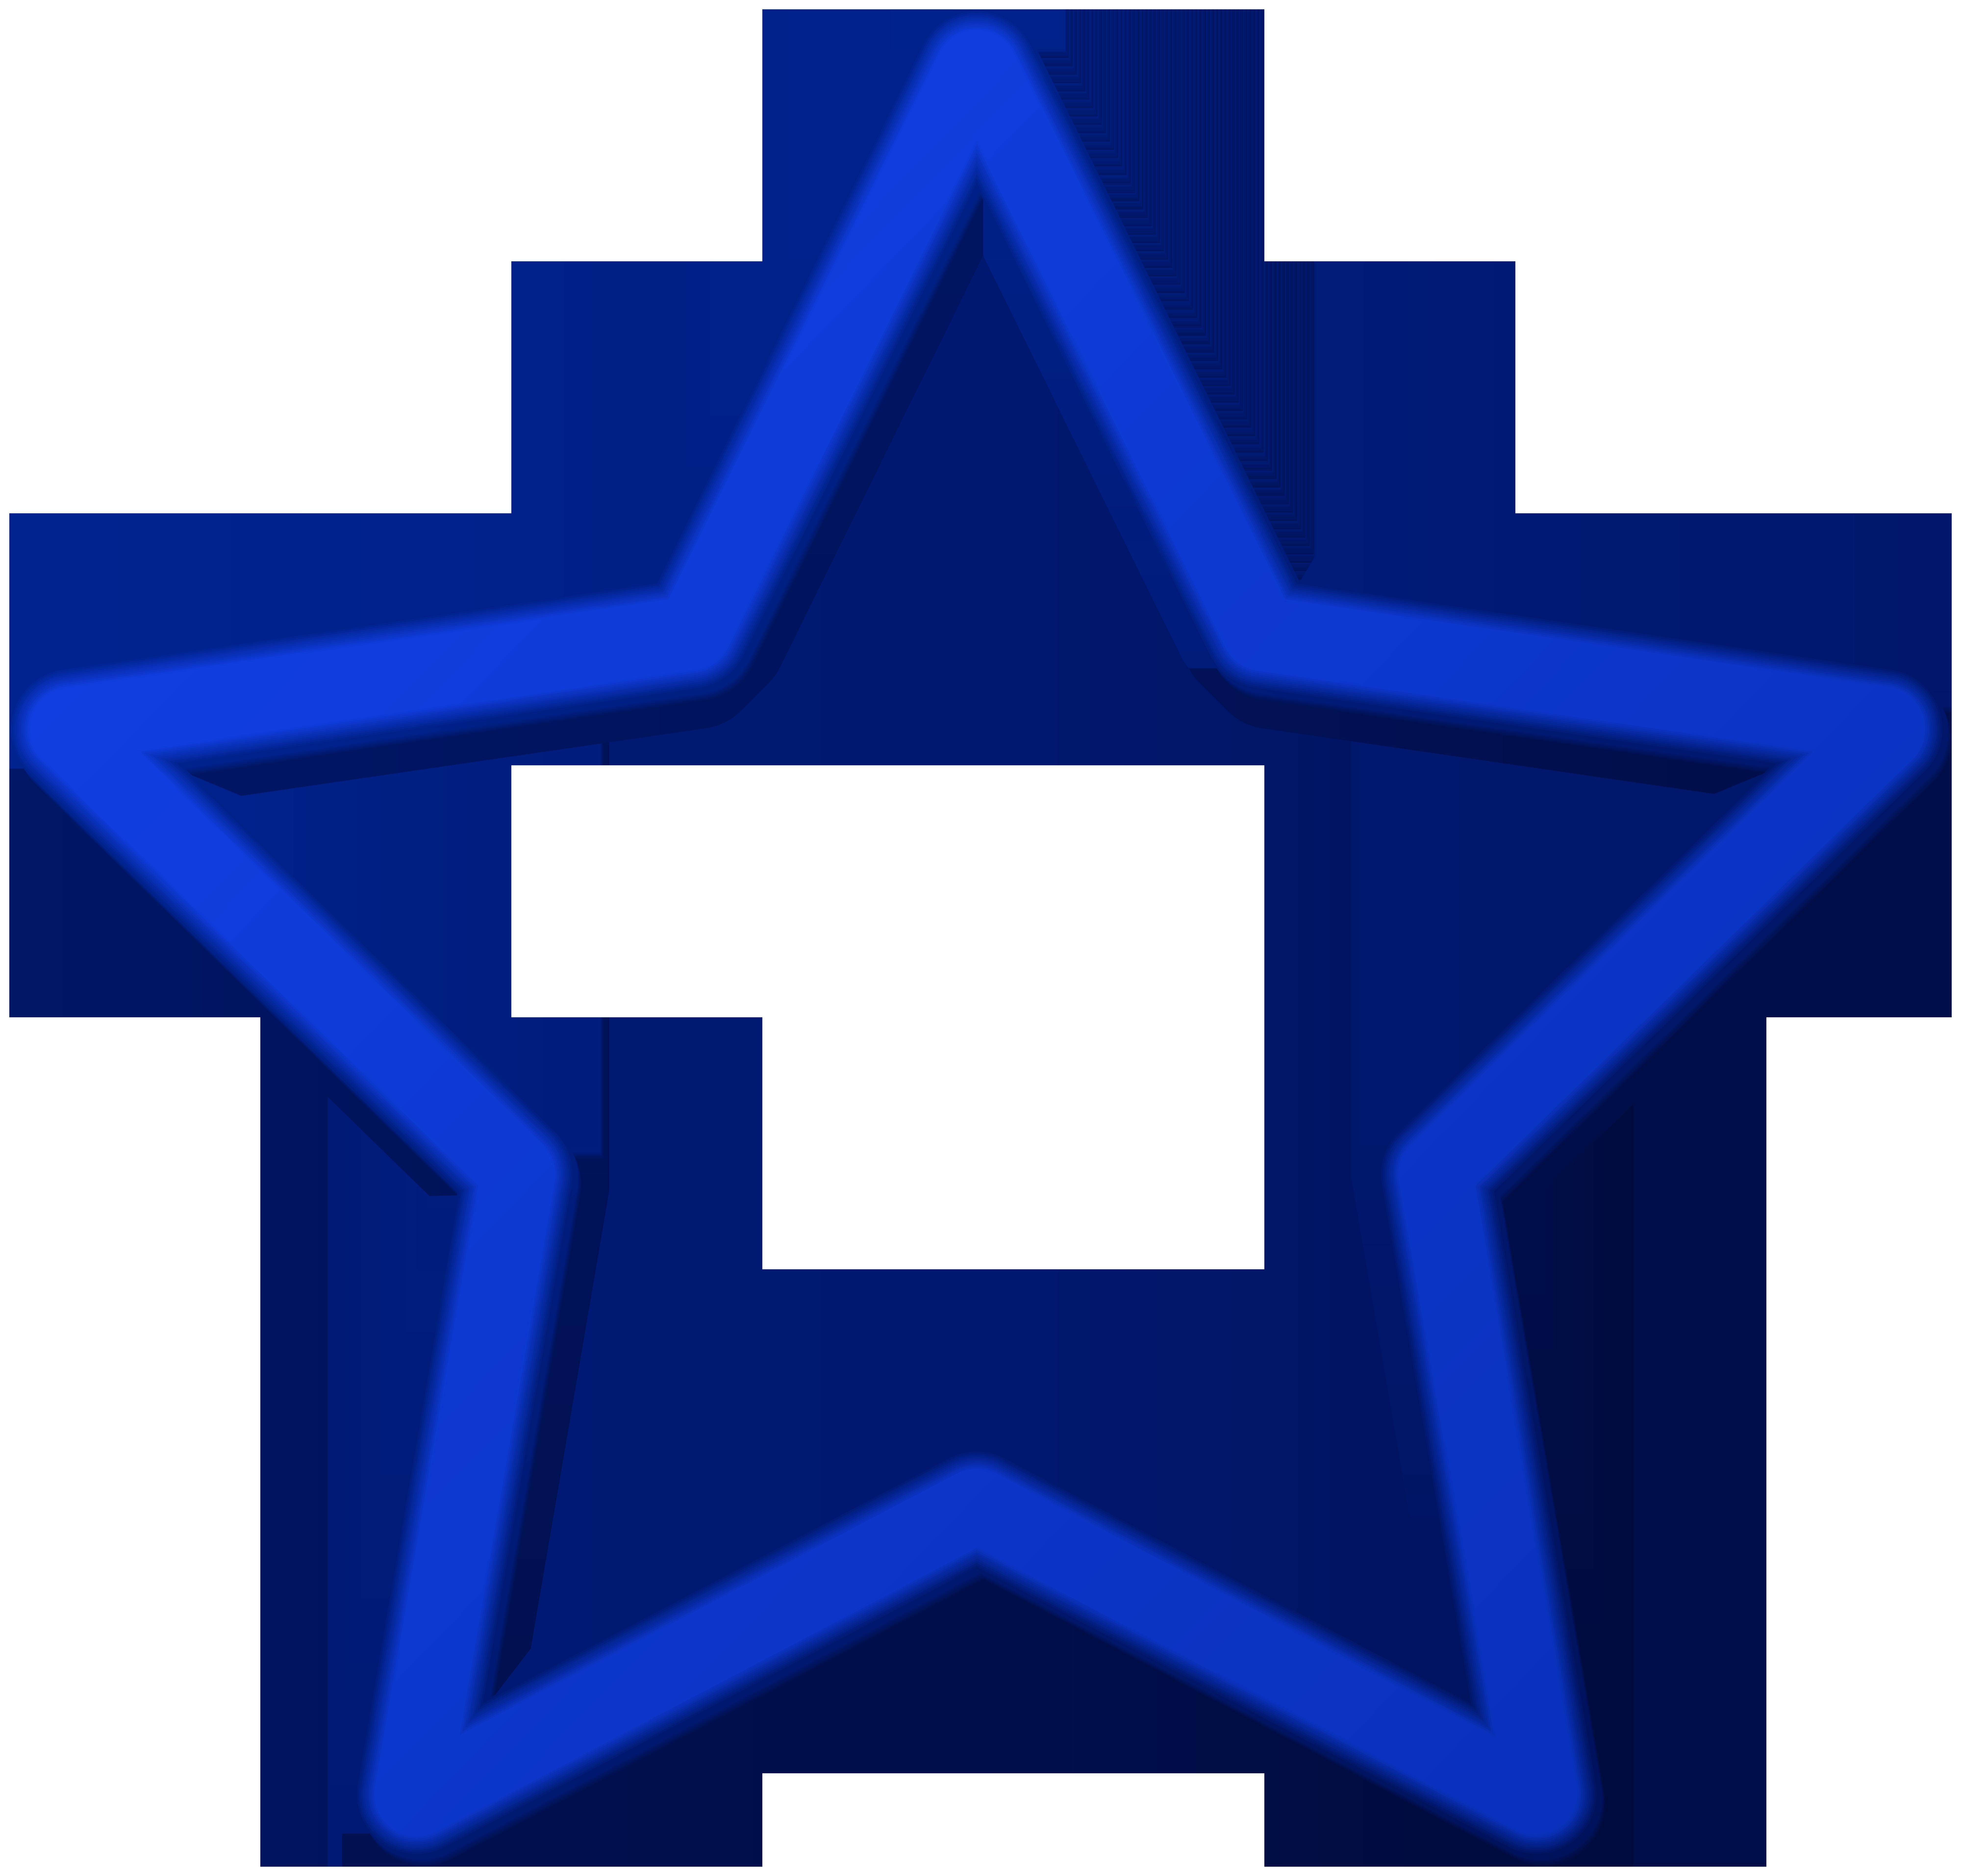 Blue star border.